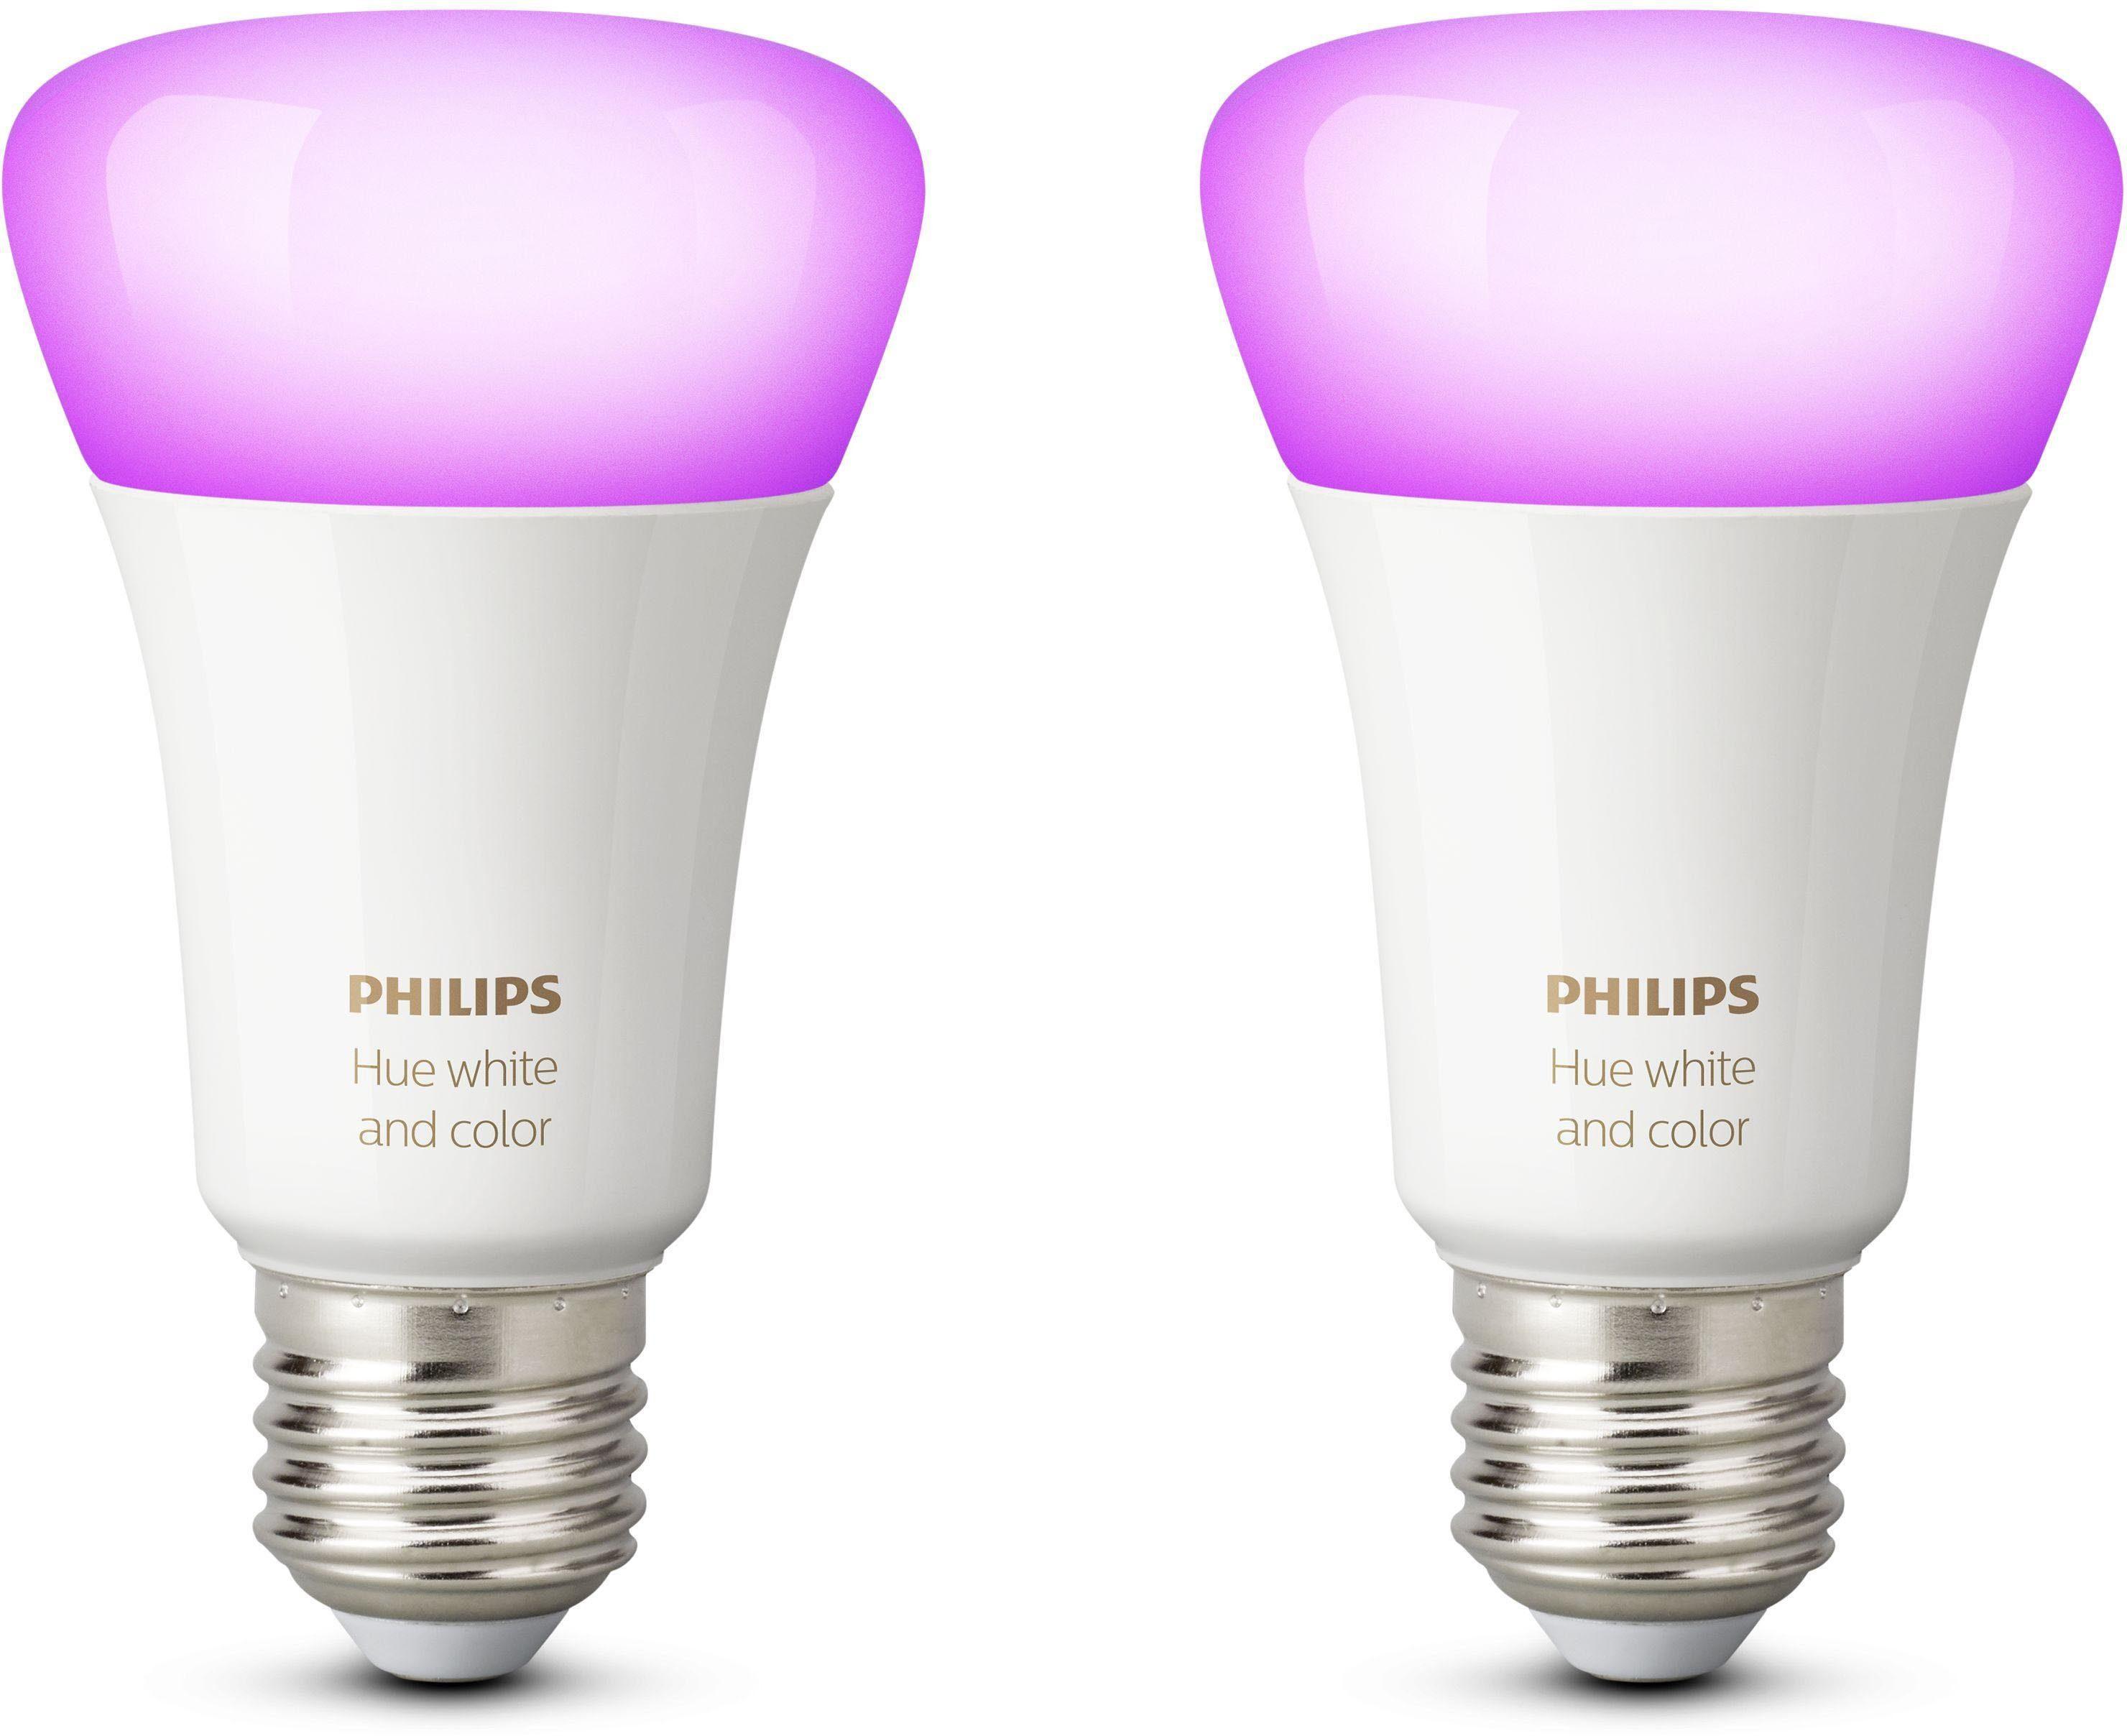 Philips Hue White & Color Ambiance E27 Doppelpack - smartes LED-Lichtsystem mit App-Steuerung